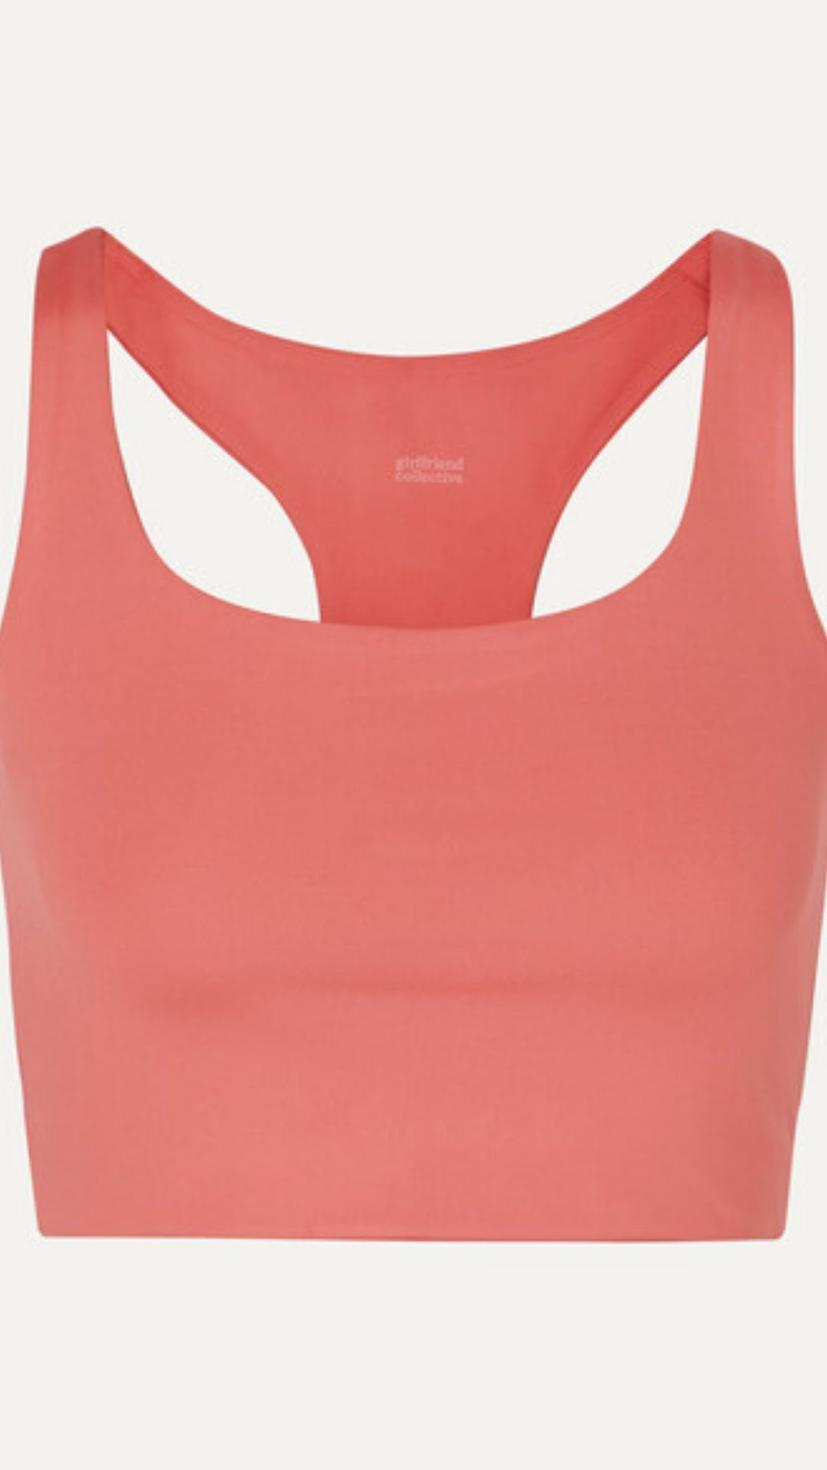 Sports wear, Gym Gear, S/S20 Gym Accessories, Spring/summer 2020 Gym Clothes, Activewear Accessories